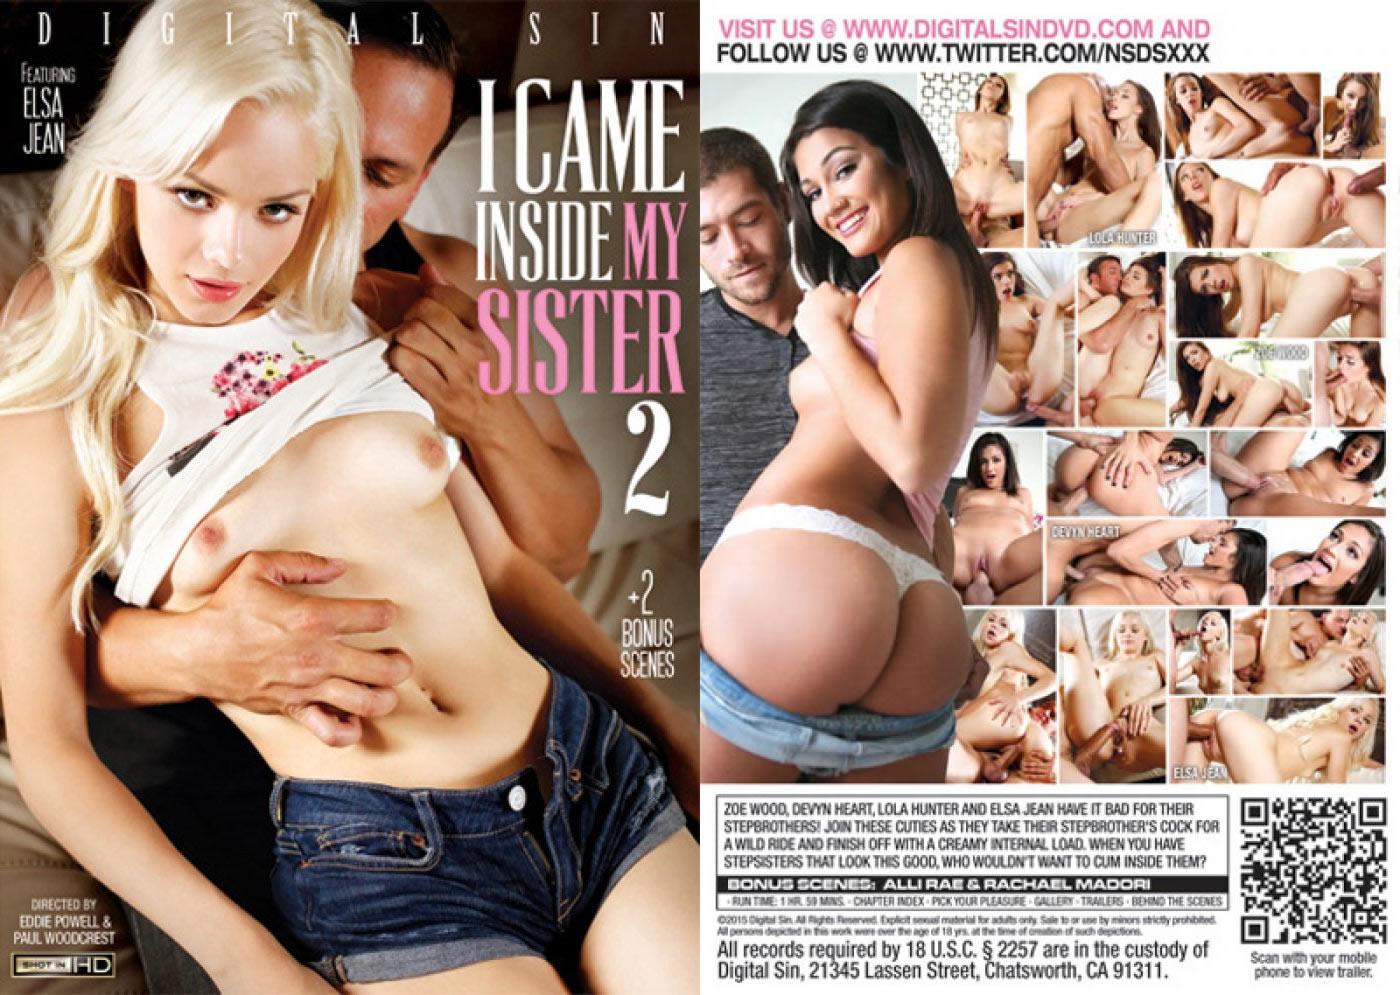 Я кончил в свою сестру - 2 / I Came Inside My Sister - 2 [Eddie Powell & Paul Woodcrest/Digital Sin] / 2015 / SD